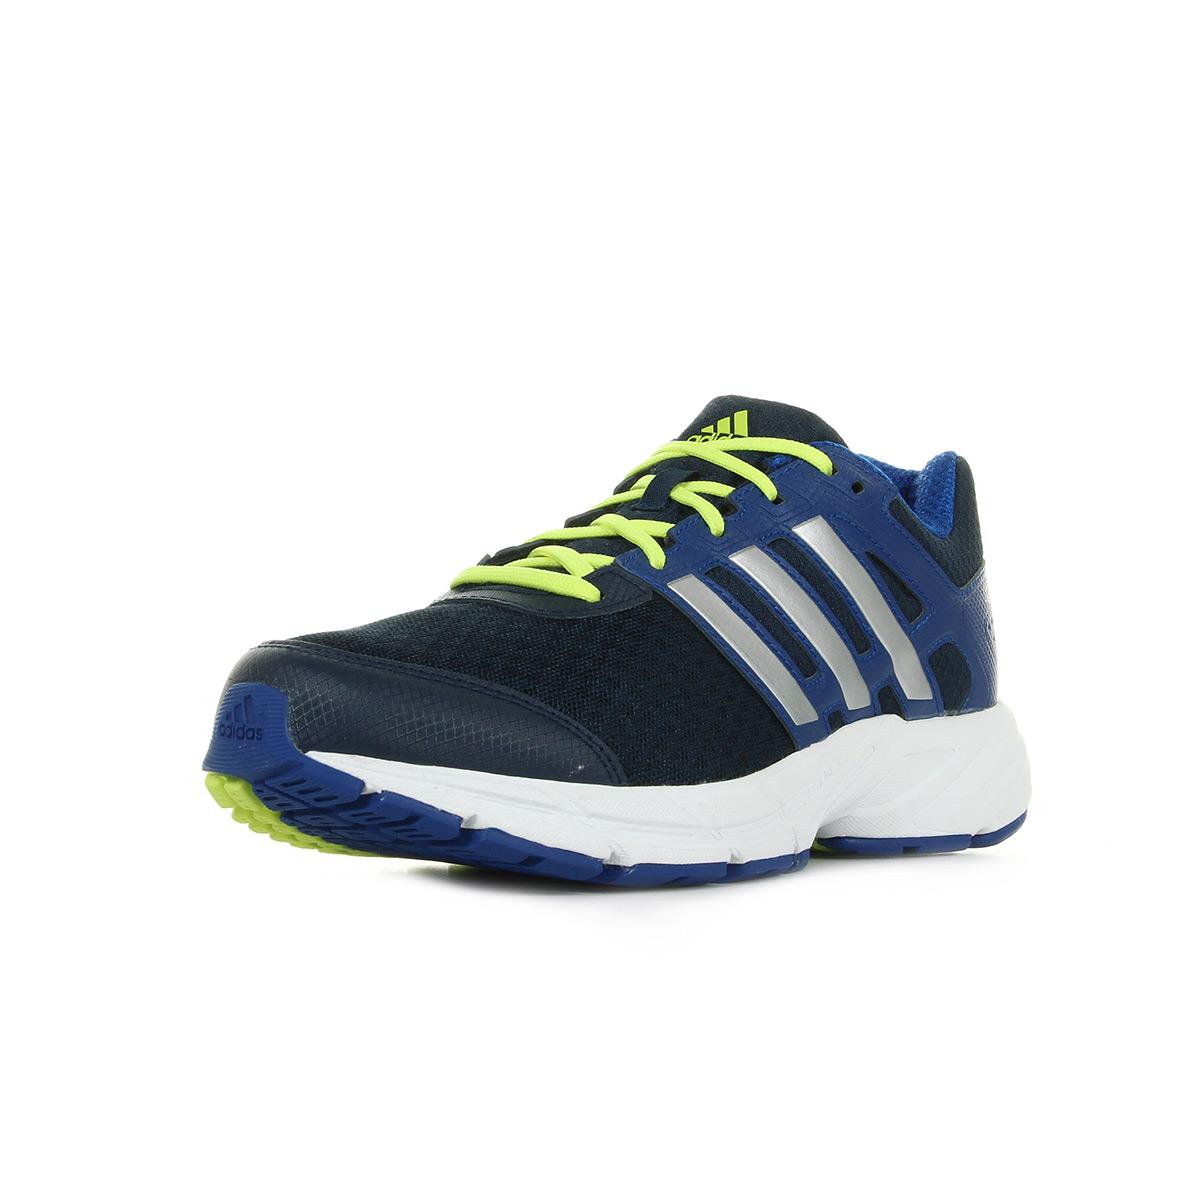 Chaussures adidas Performance femme Lightster 2 Running taille Bleu marine Bleue